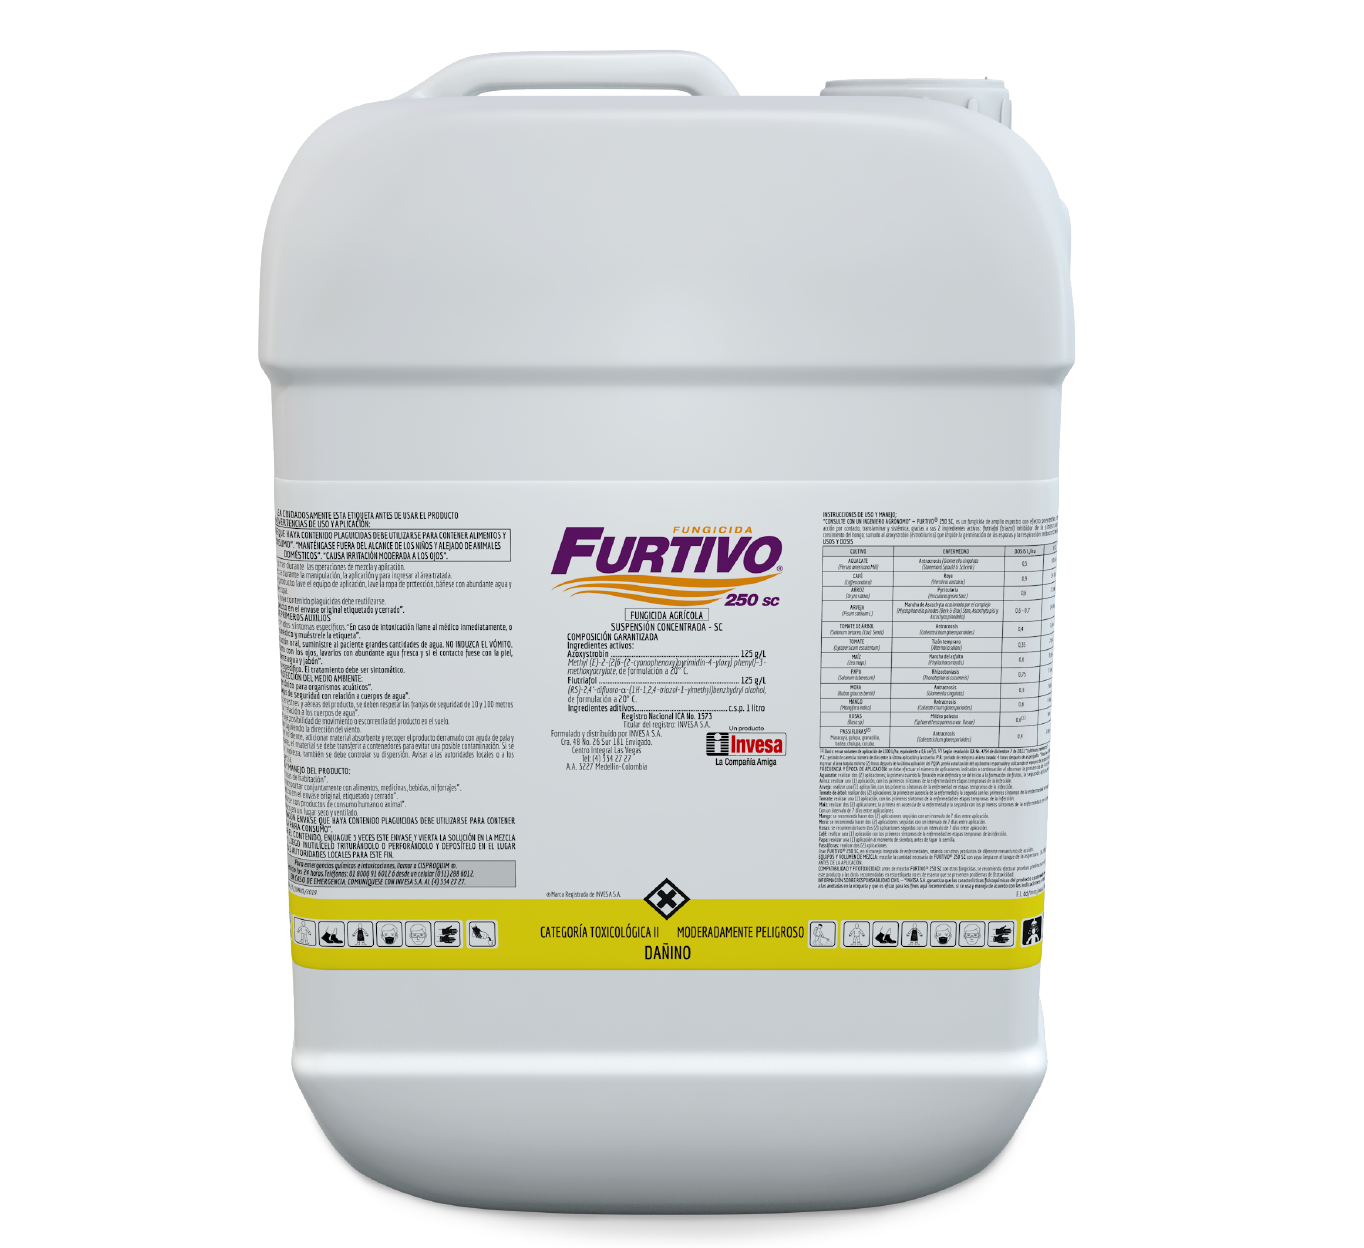 Fungicida furtivo 250 sc invesa 20 litros